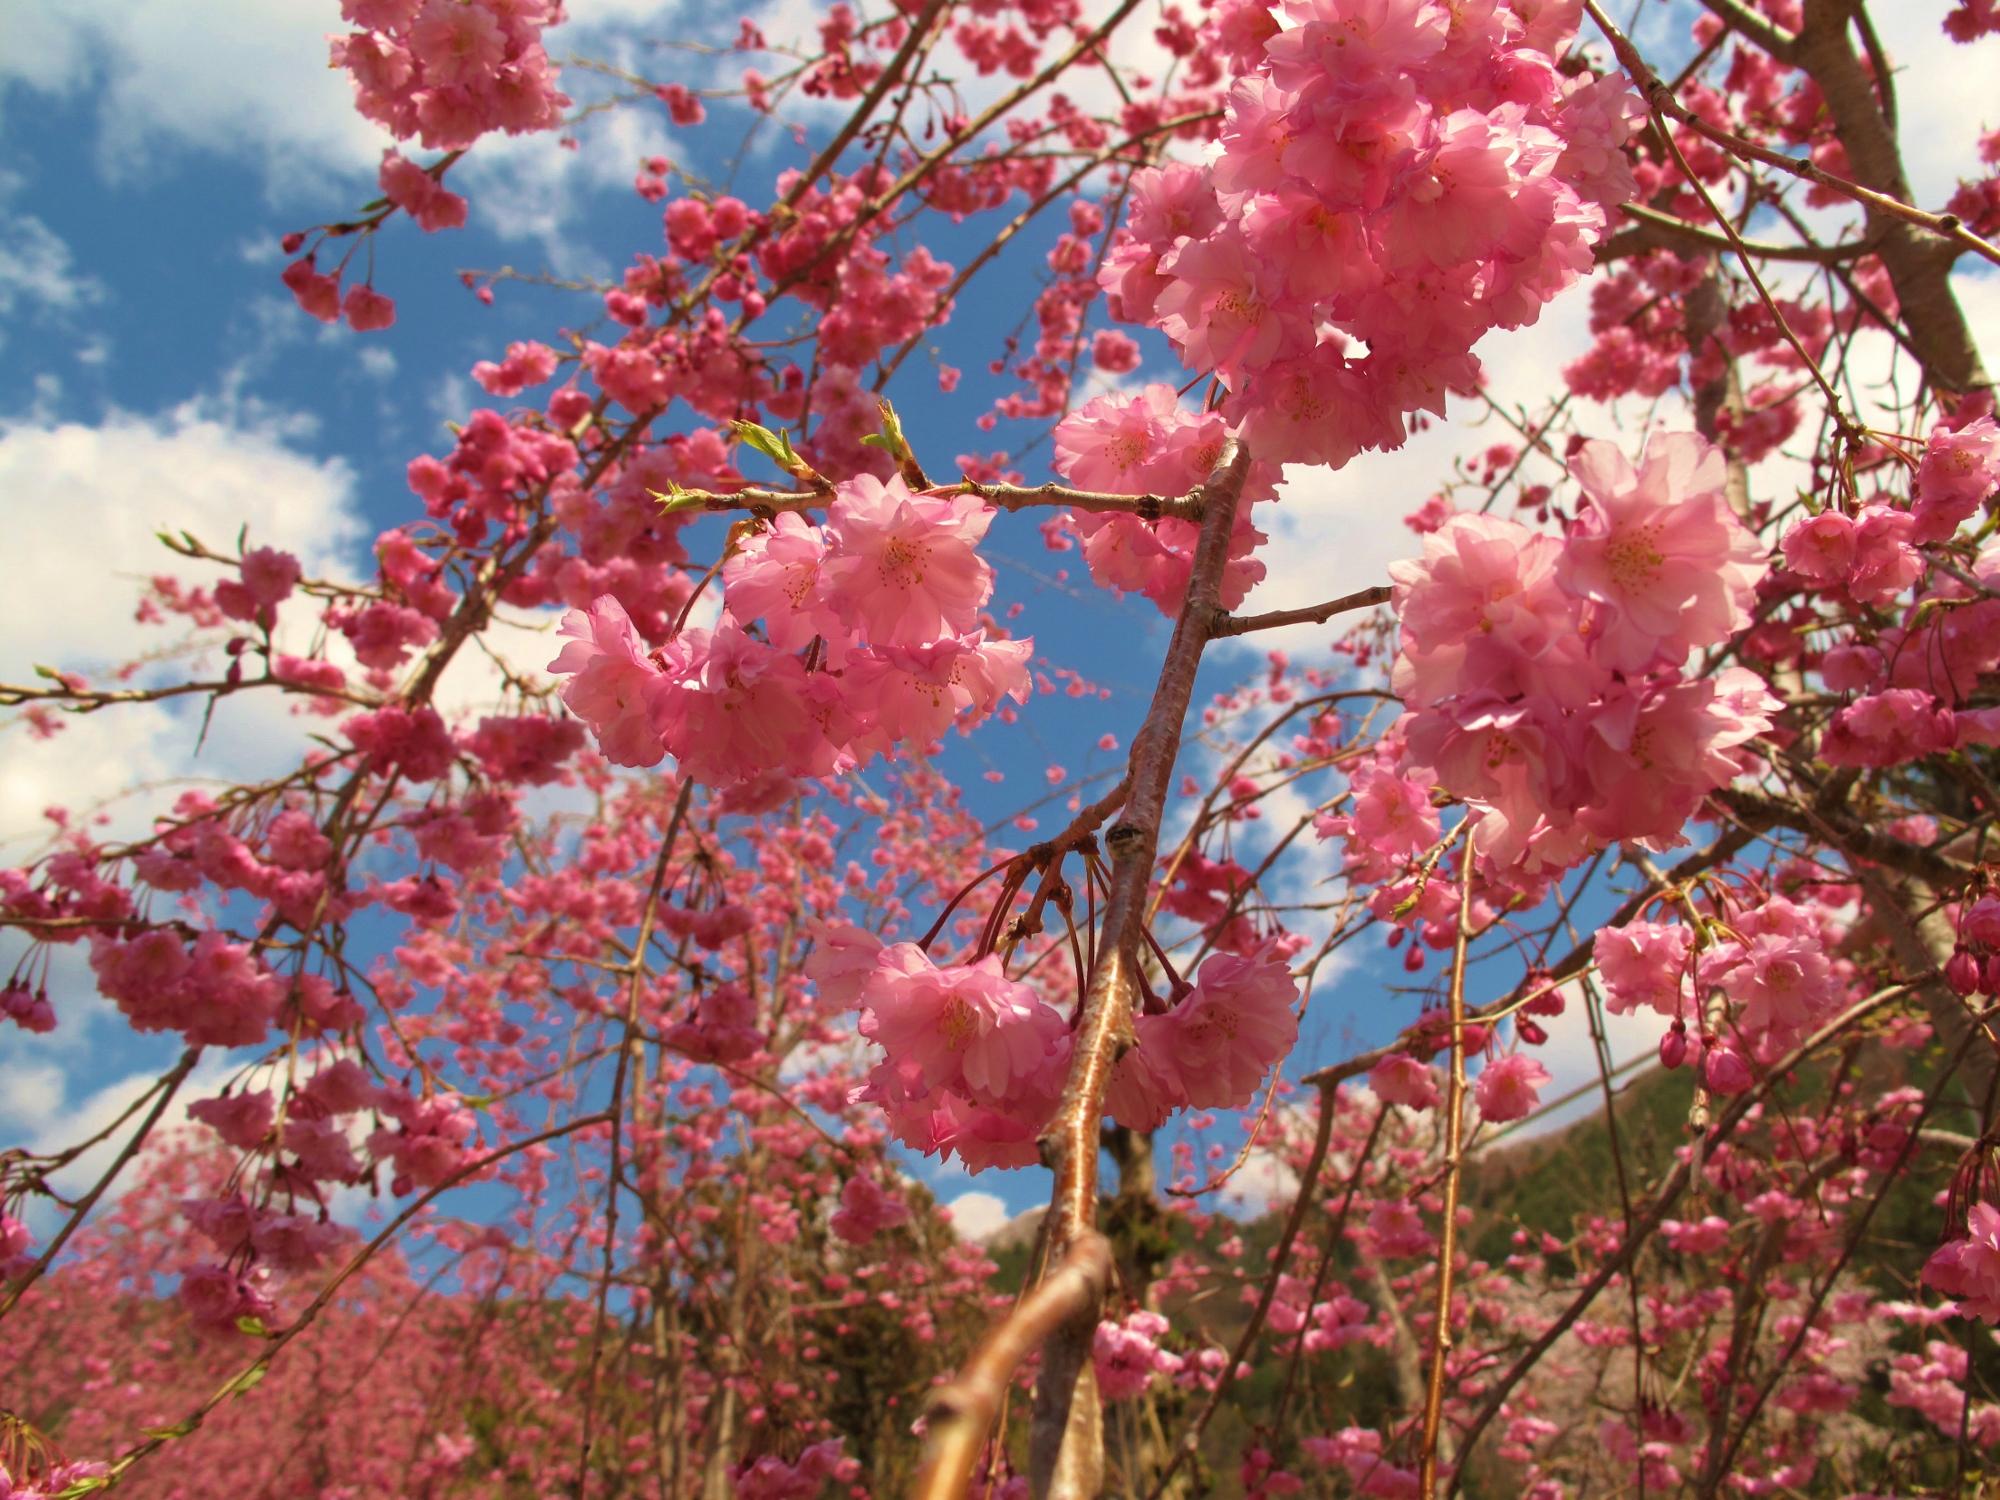 (I think it is) Sakura in Japan